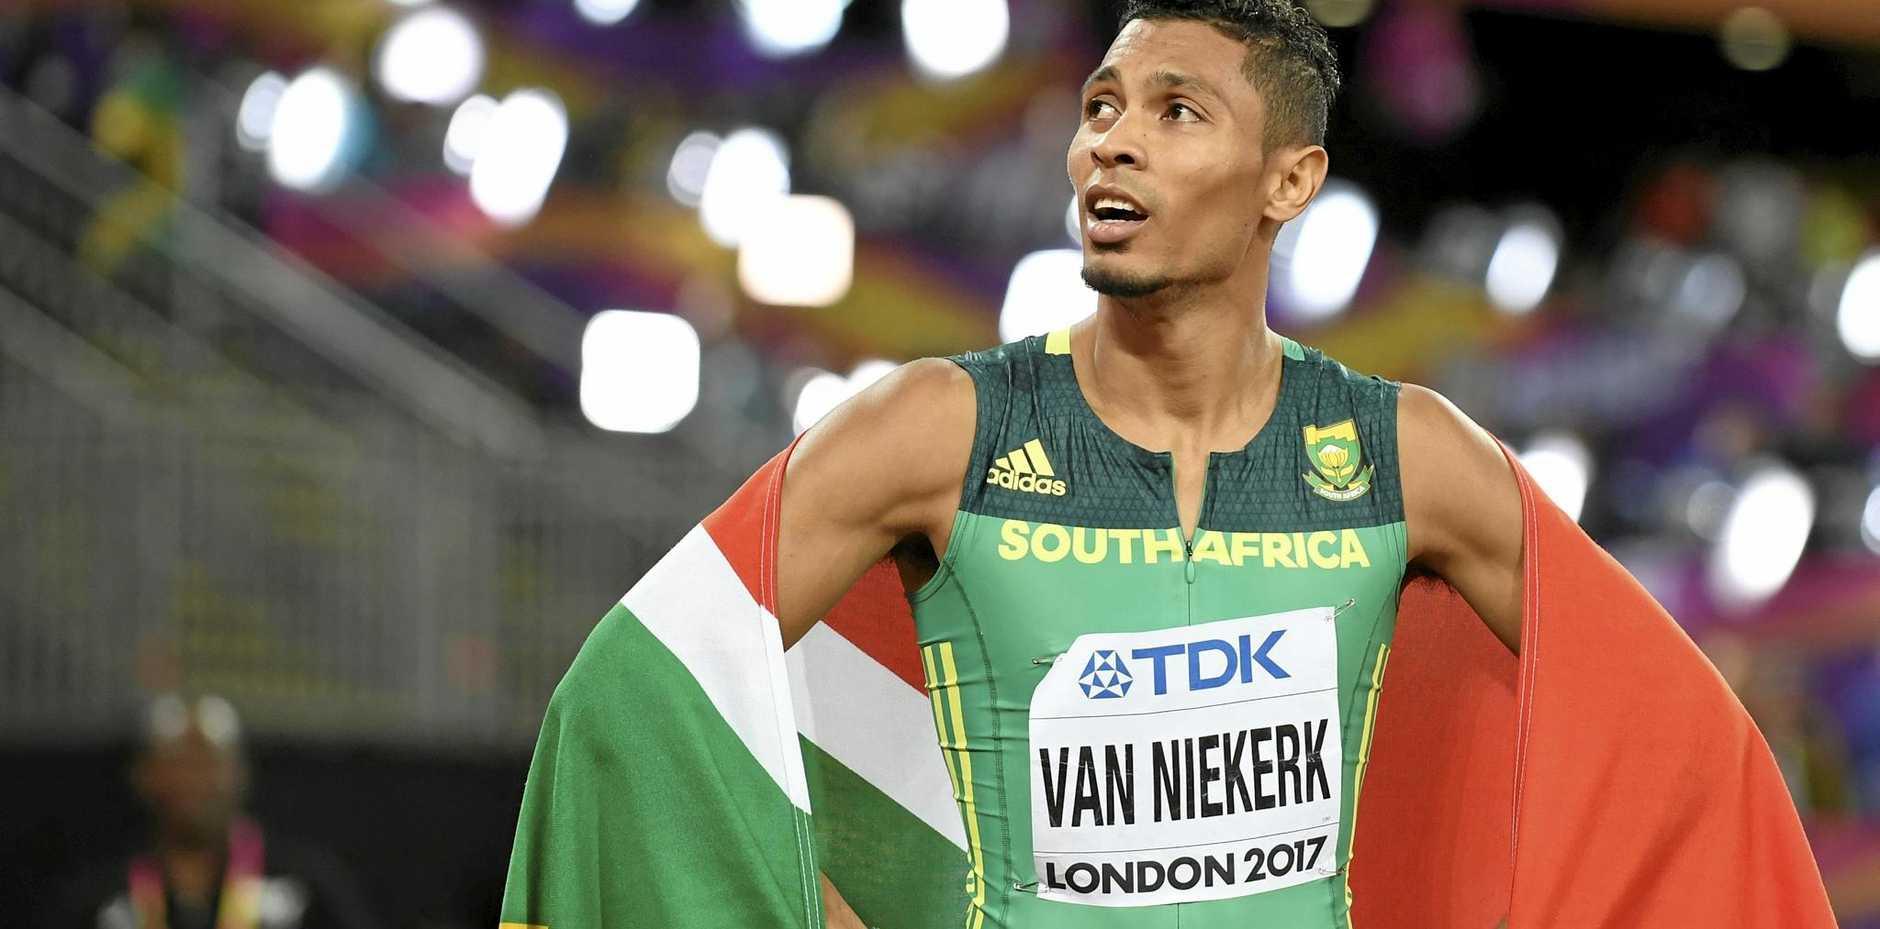 Silver medallist Wayde van Niekerk of South Africa after the men's 200m final.